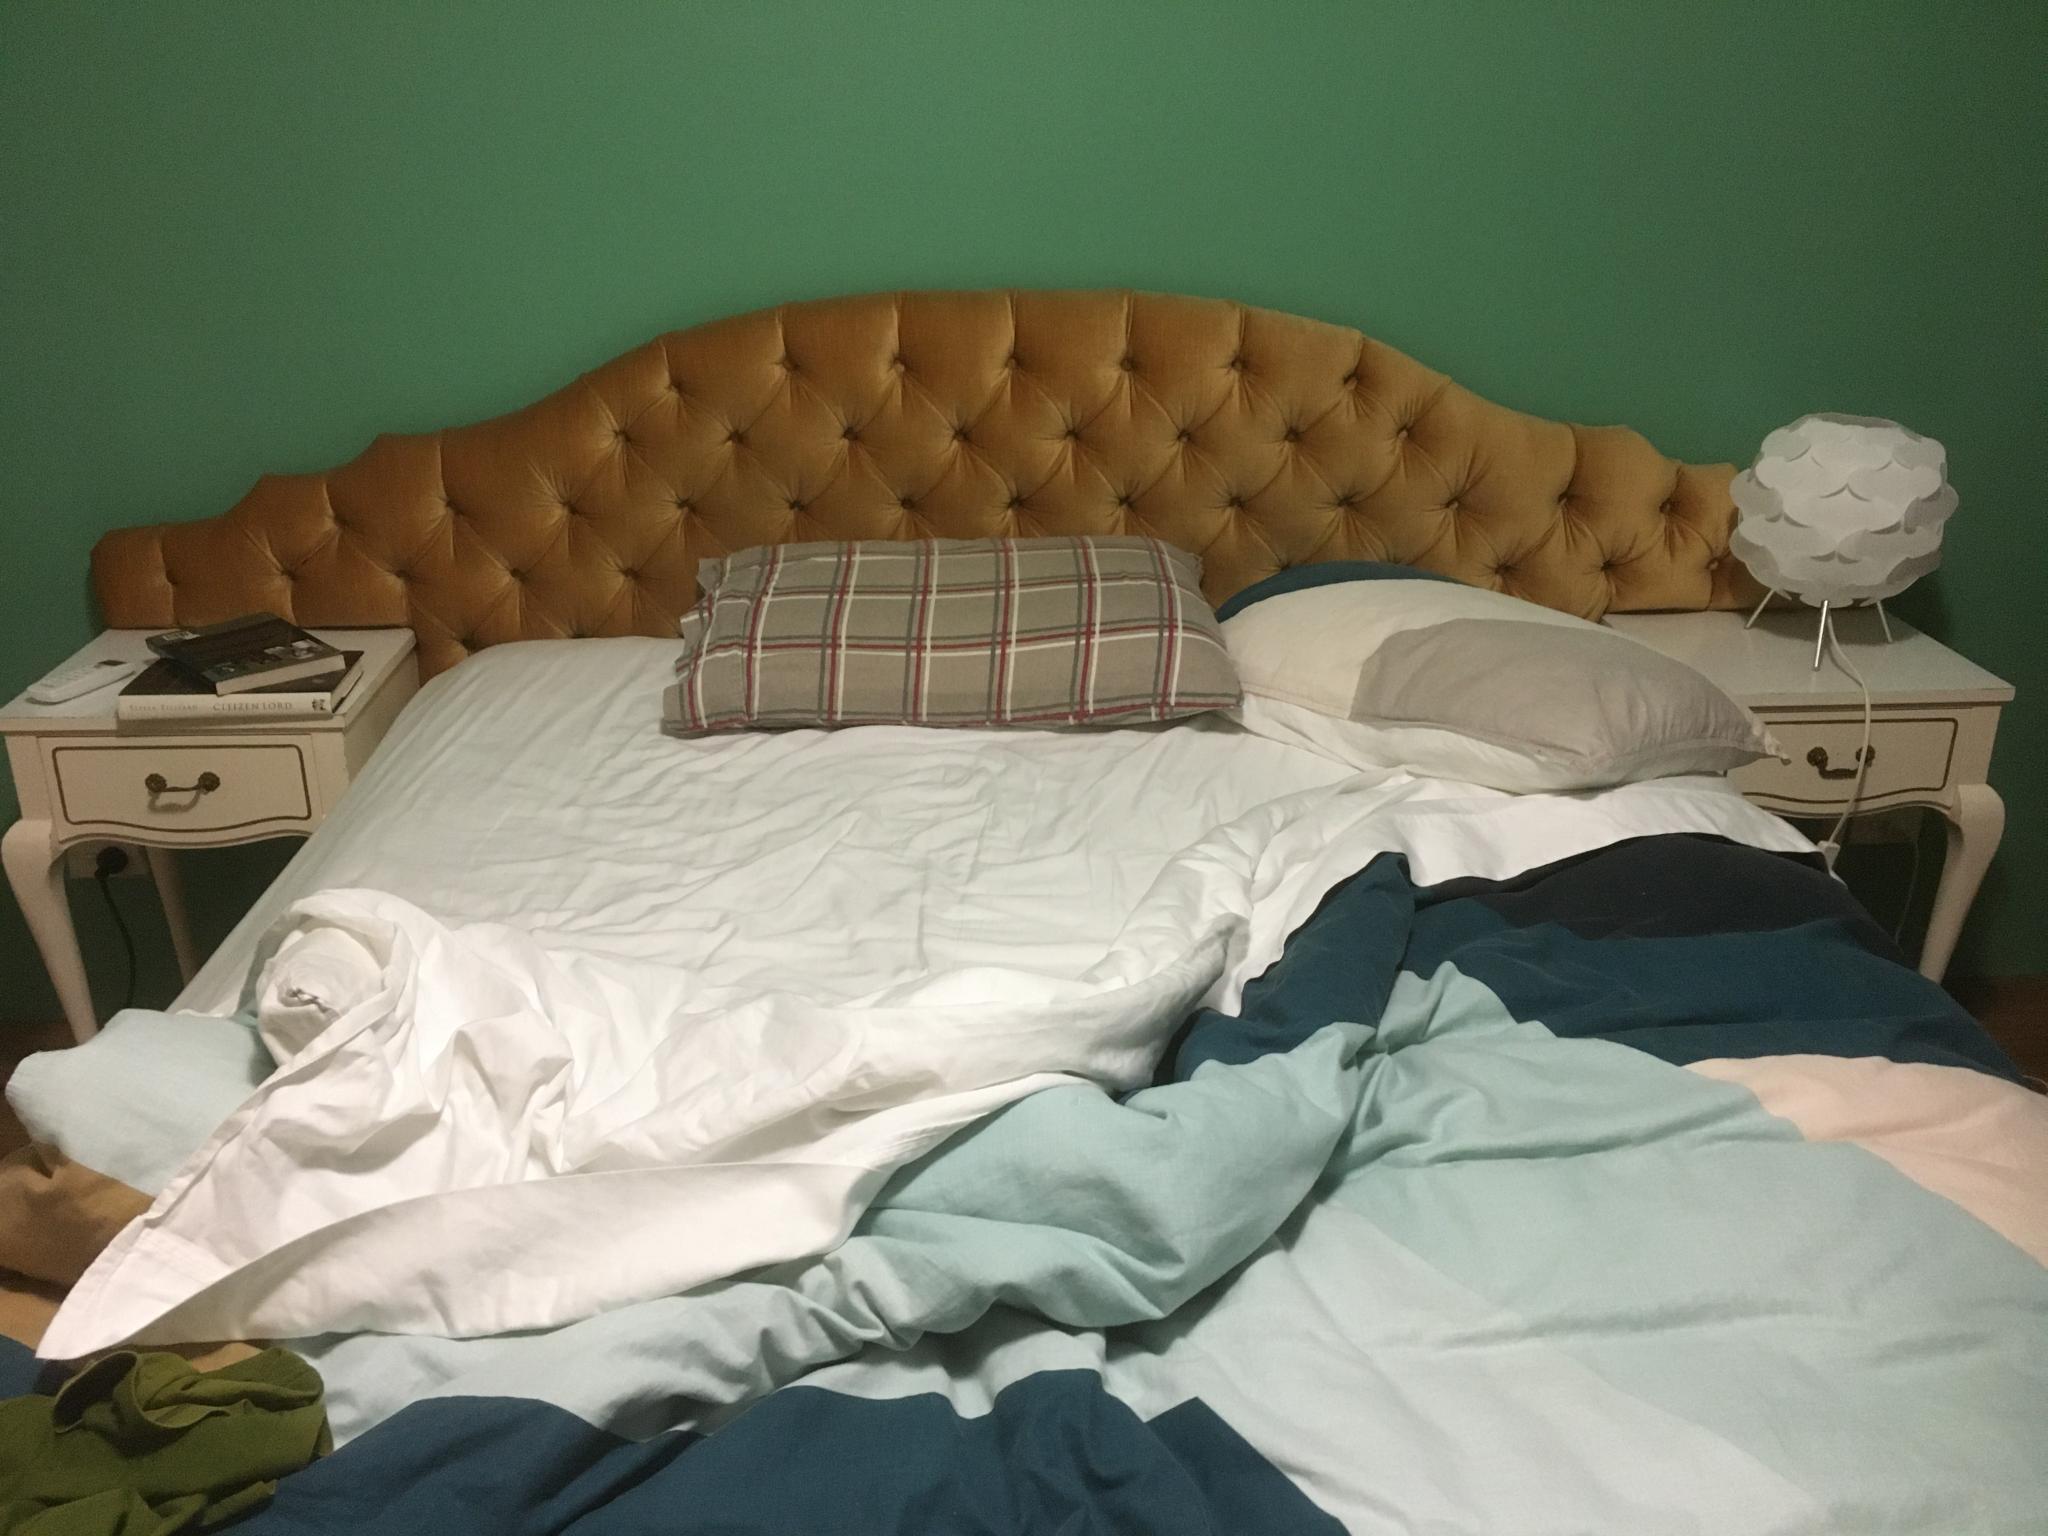 Show us your bed....-e52ea020-8ef1-43ab-8205-913e16369d38-jpg